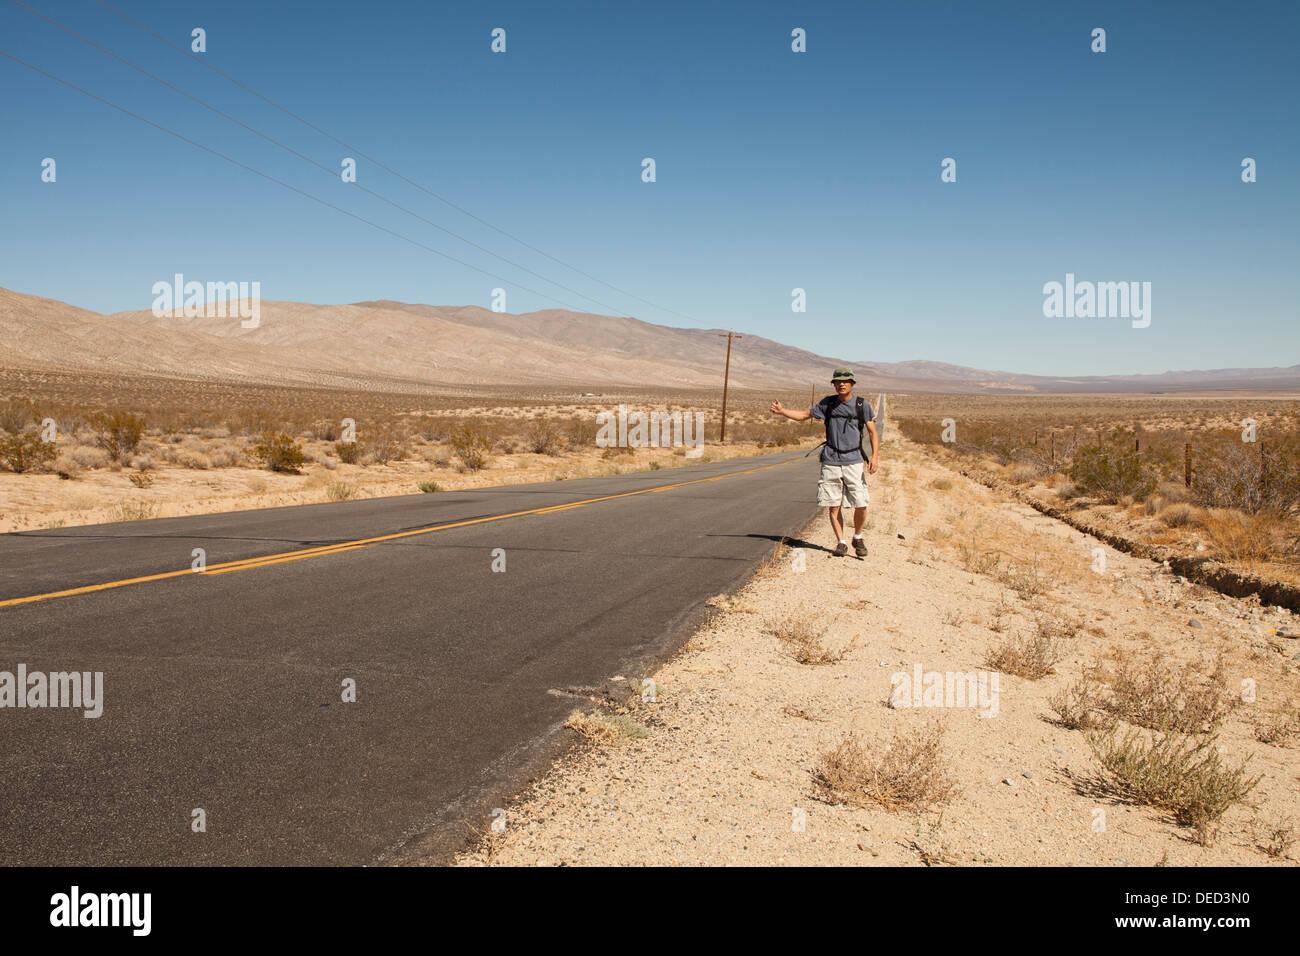 Man hitchhiking on a rural desert road - California USA - Stock Image